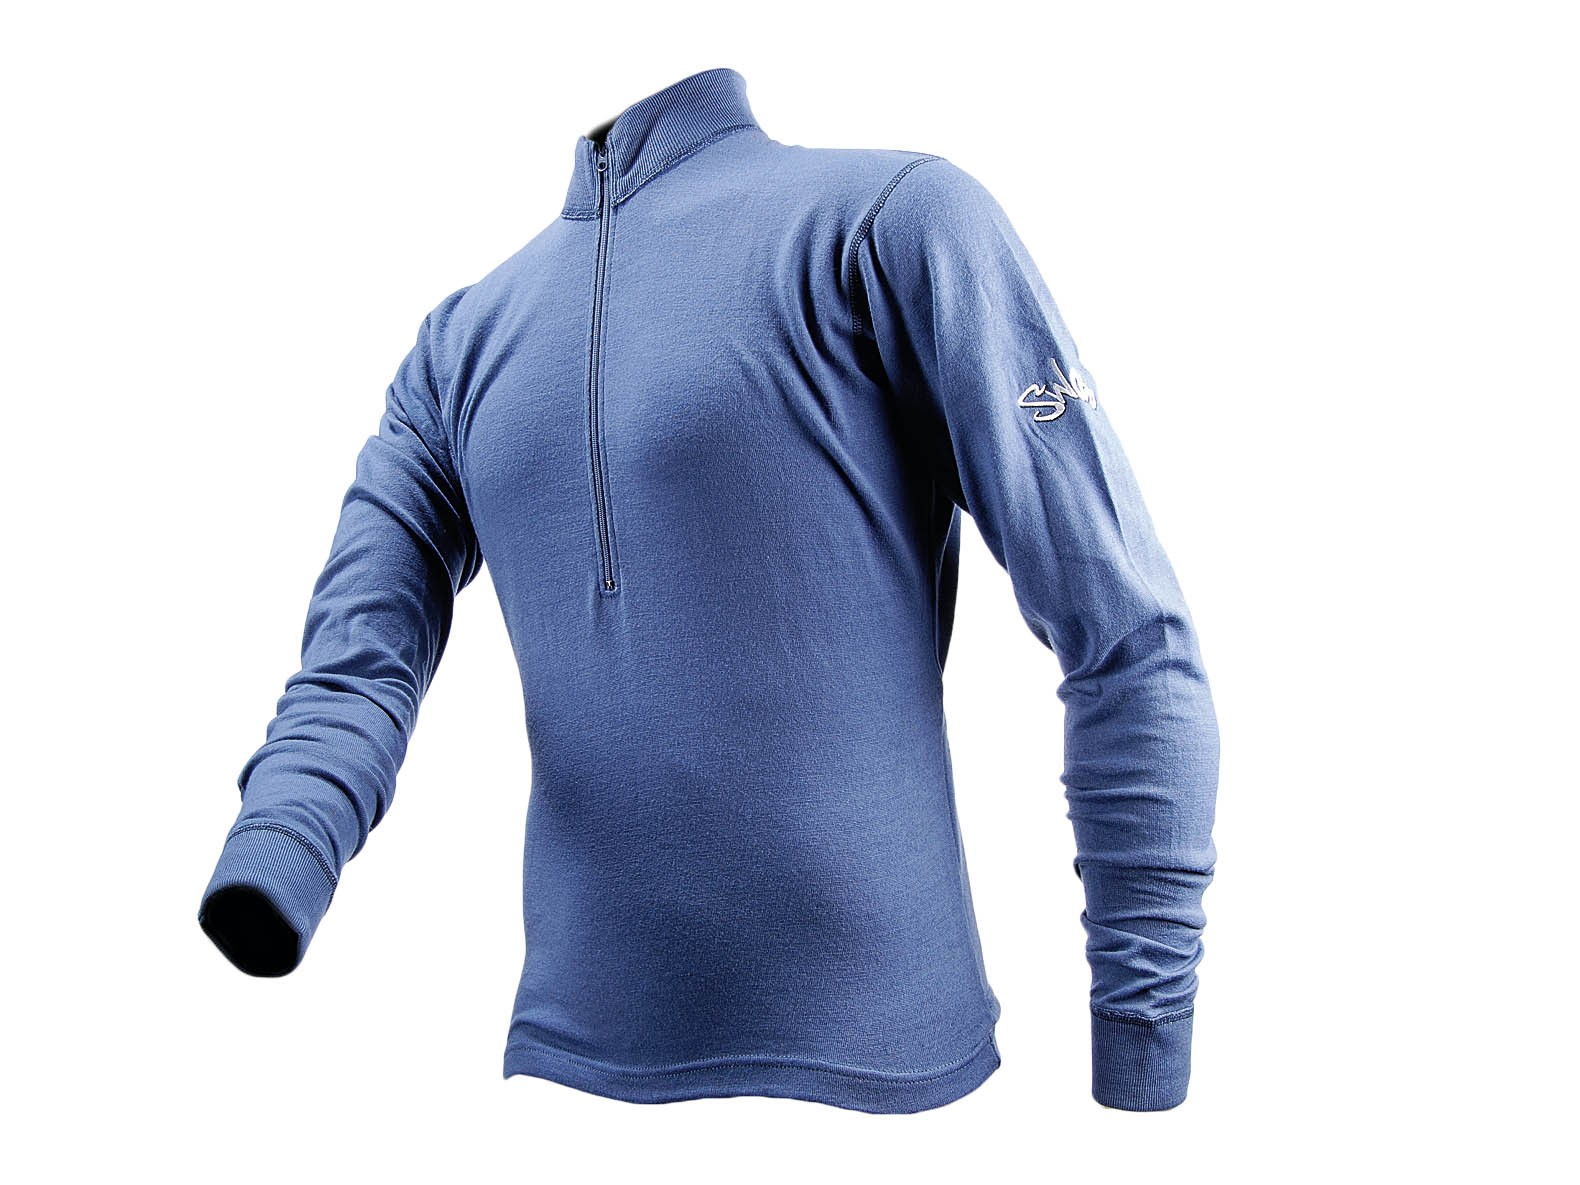 Swobo Merino Long Sleeve Jersey